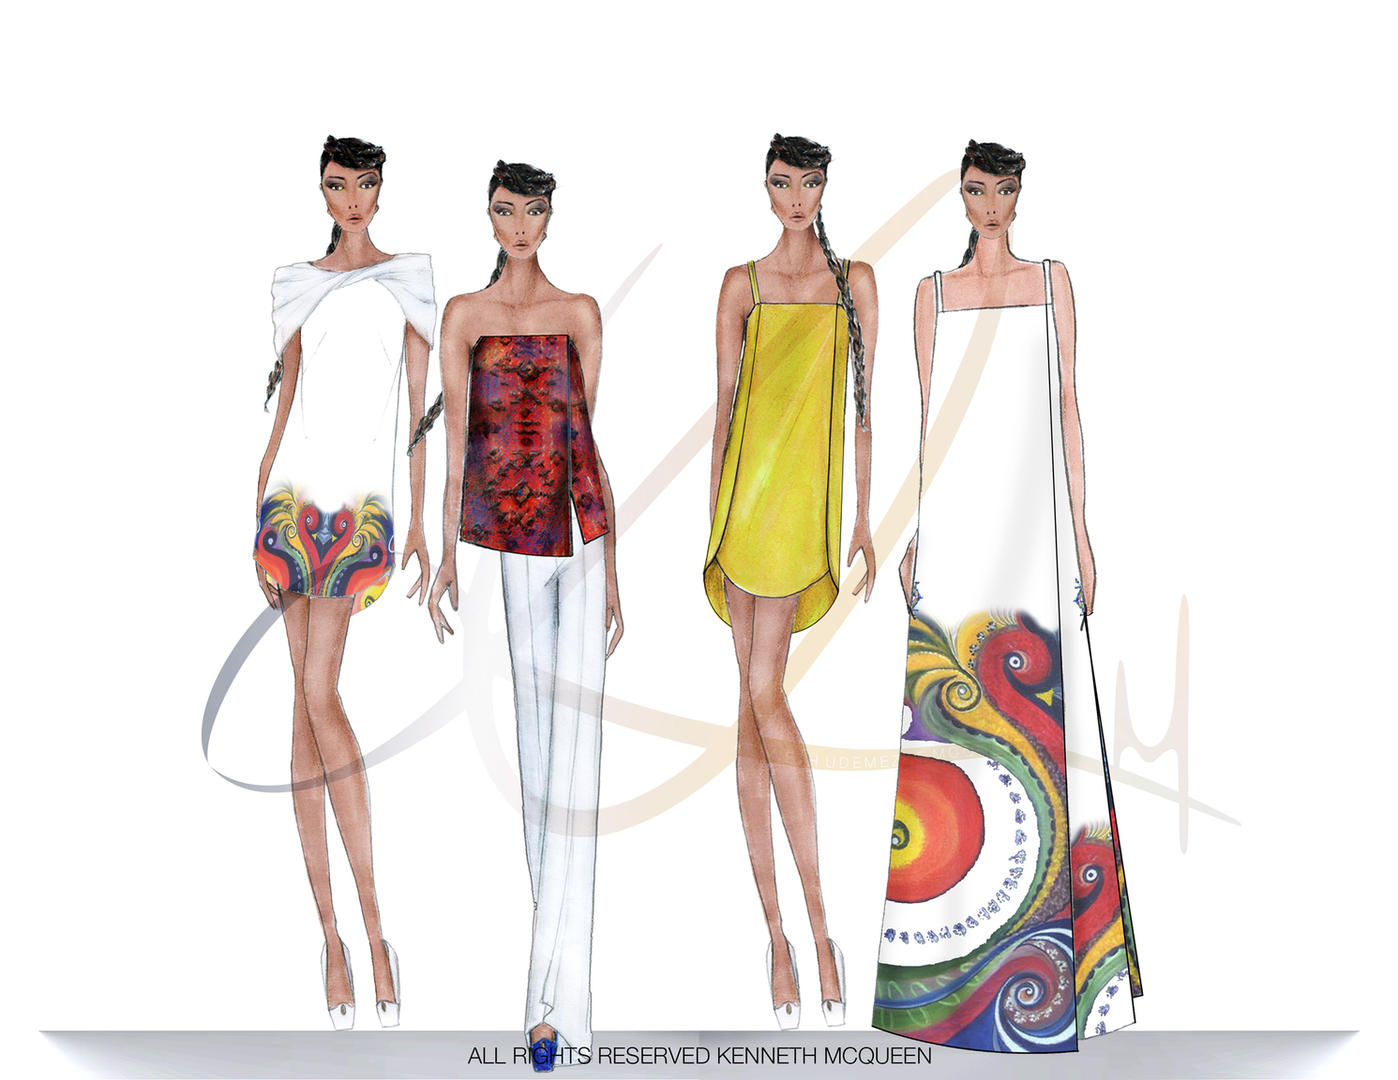 kenneth mcqueen fashion design